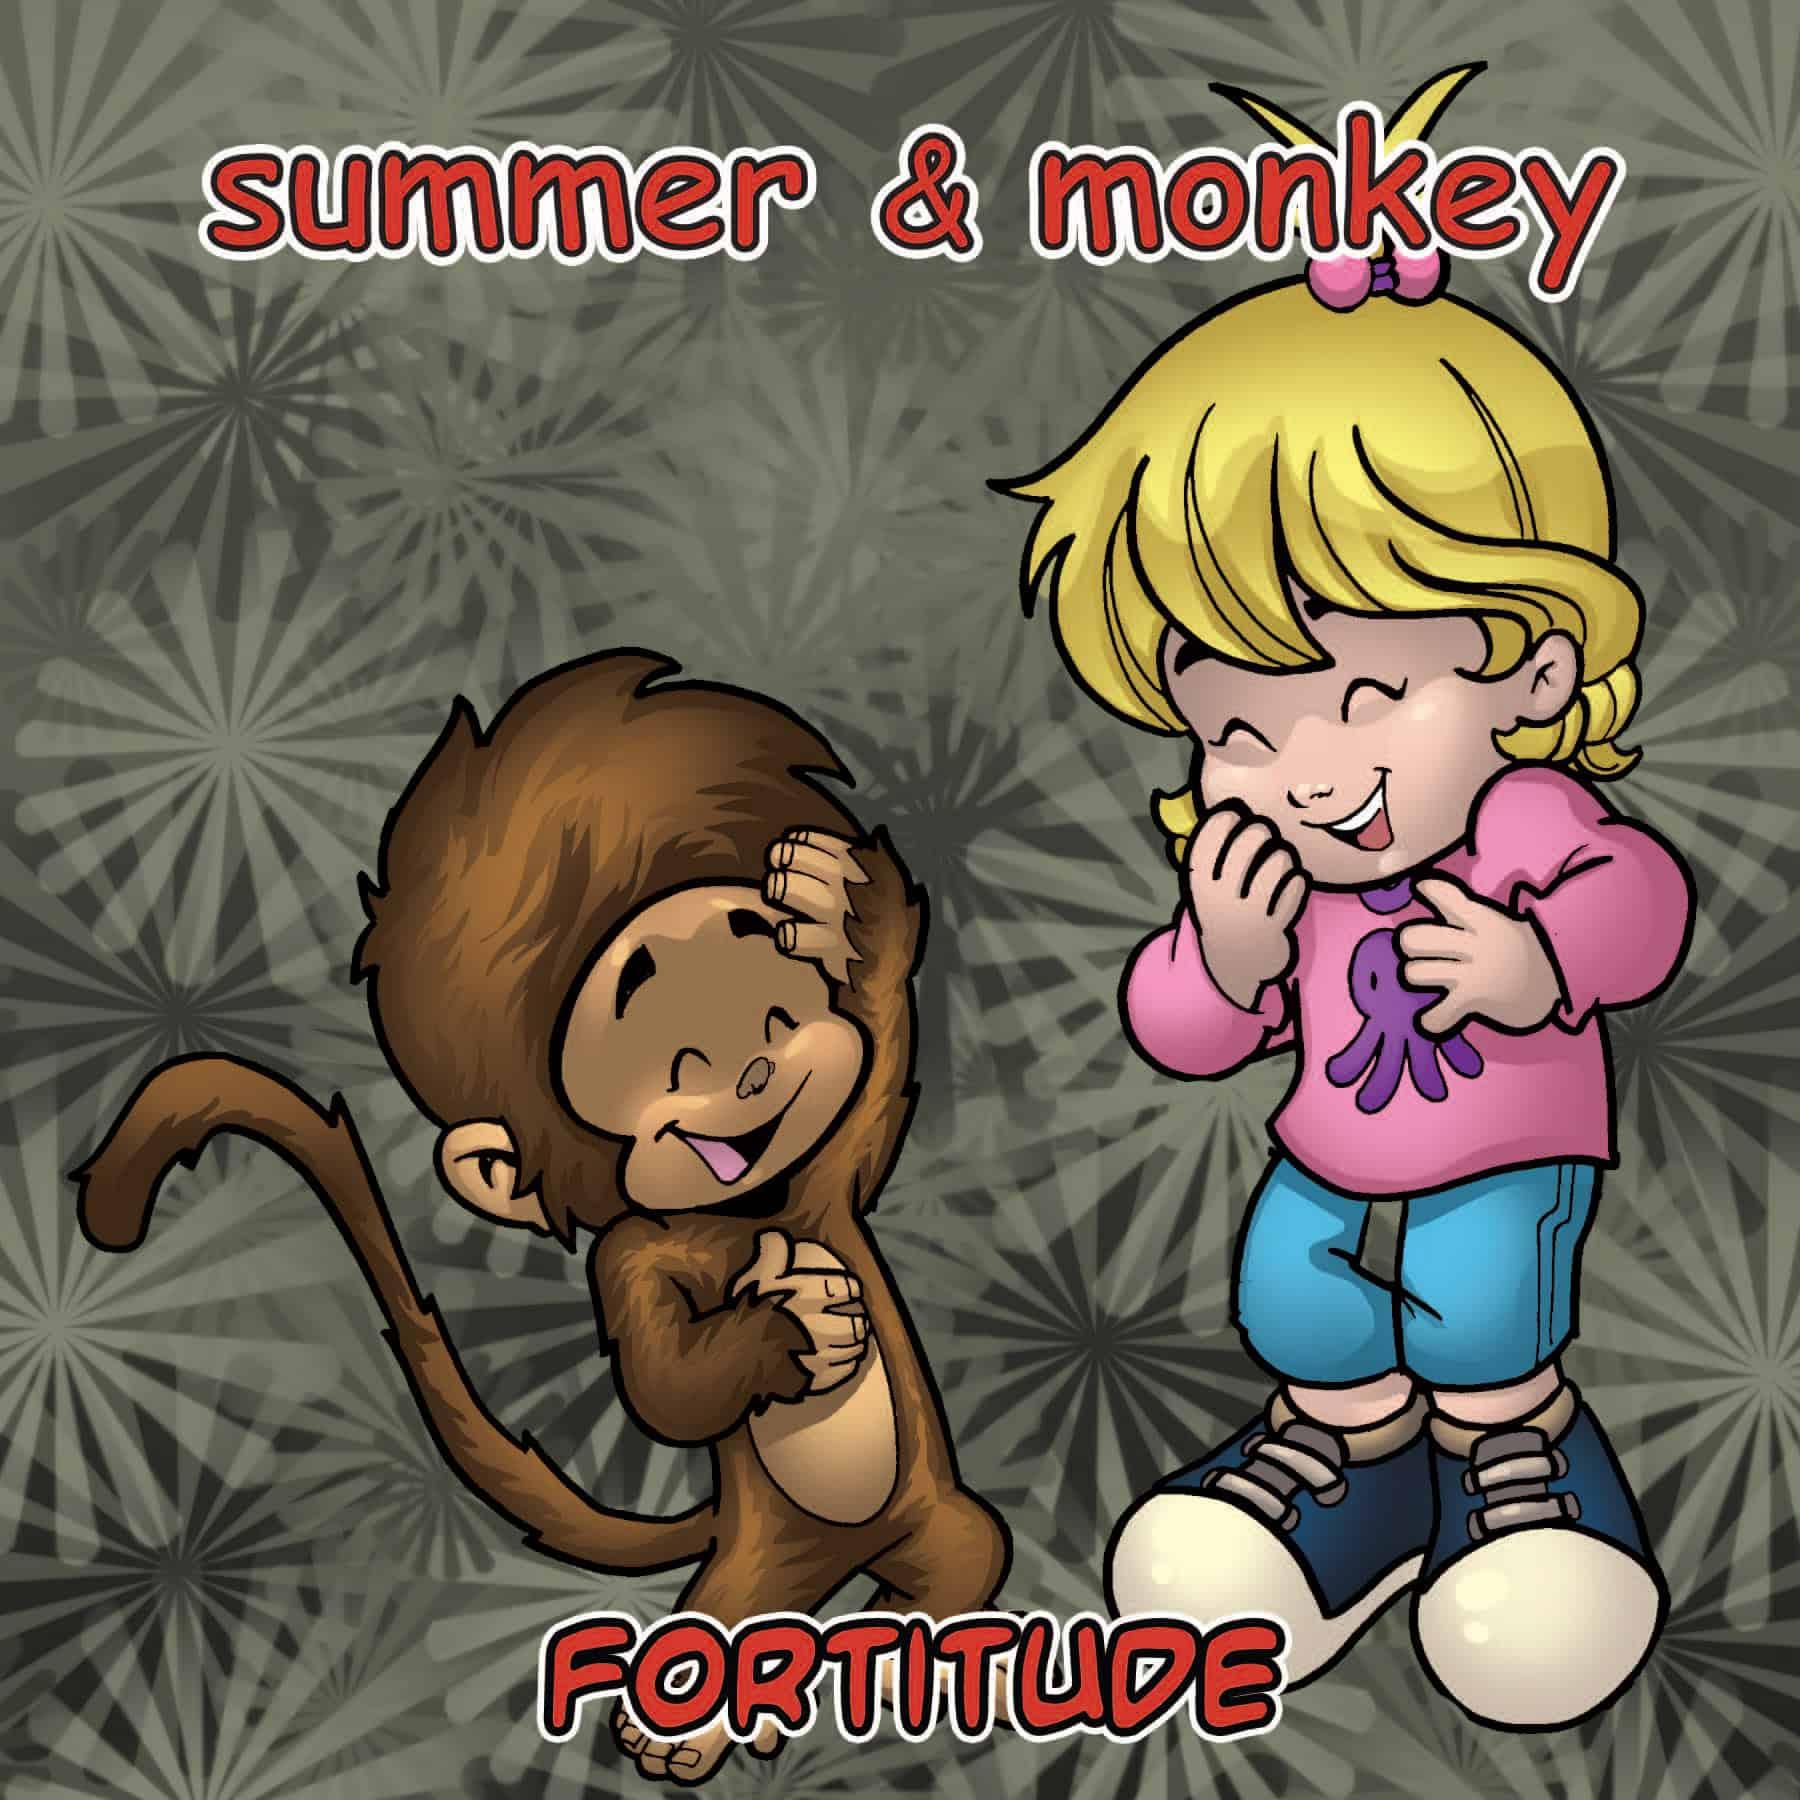 Summer_Fortitude-300dpi-1